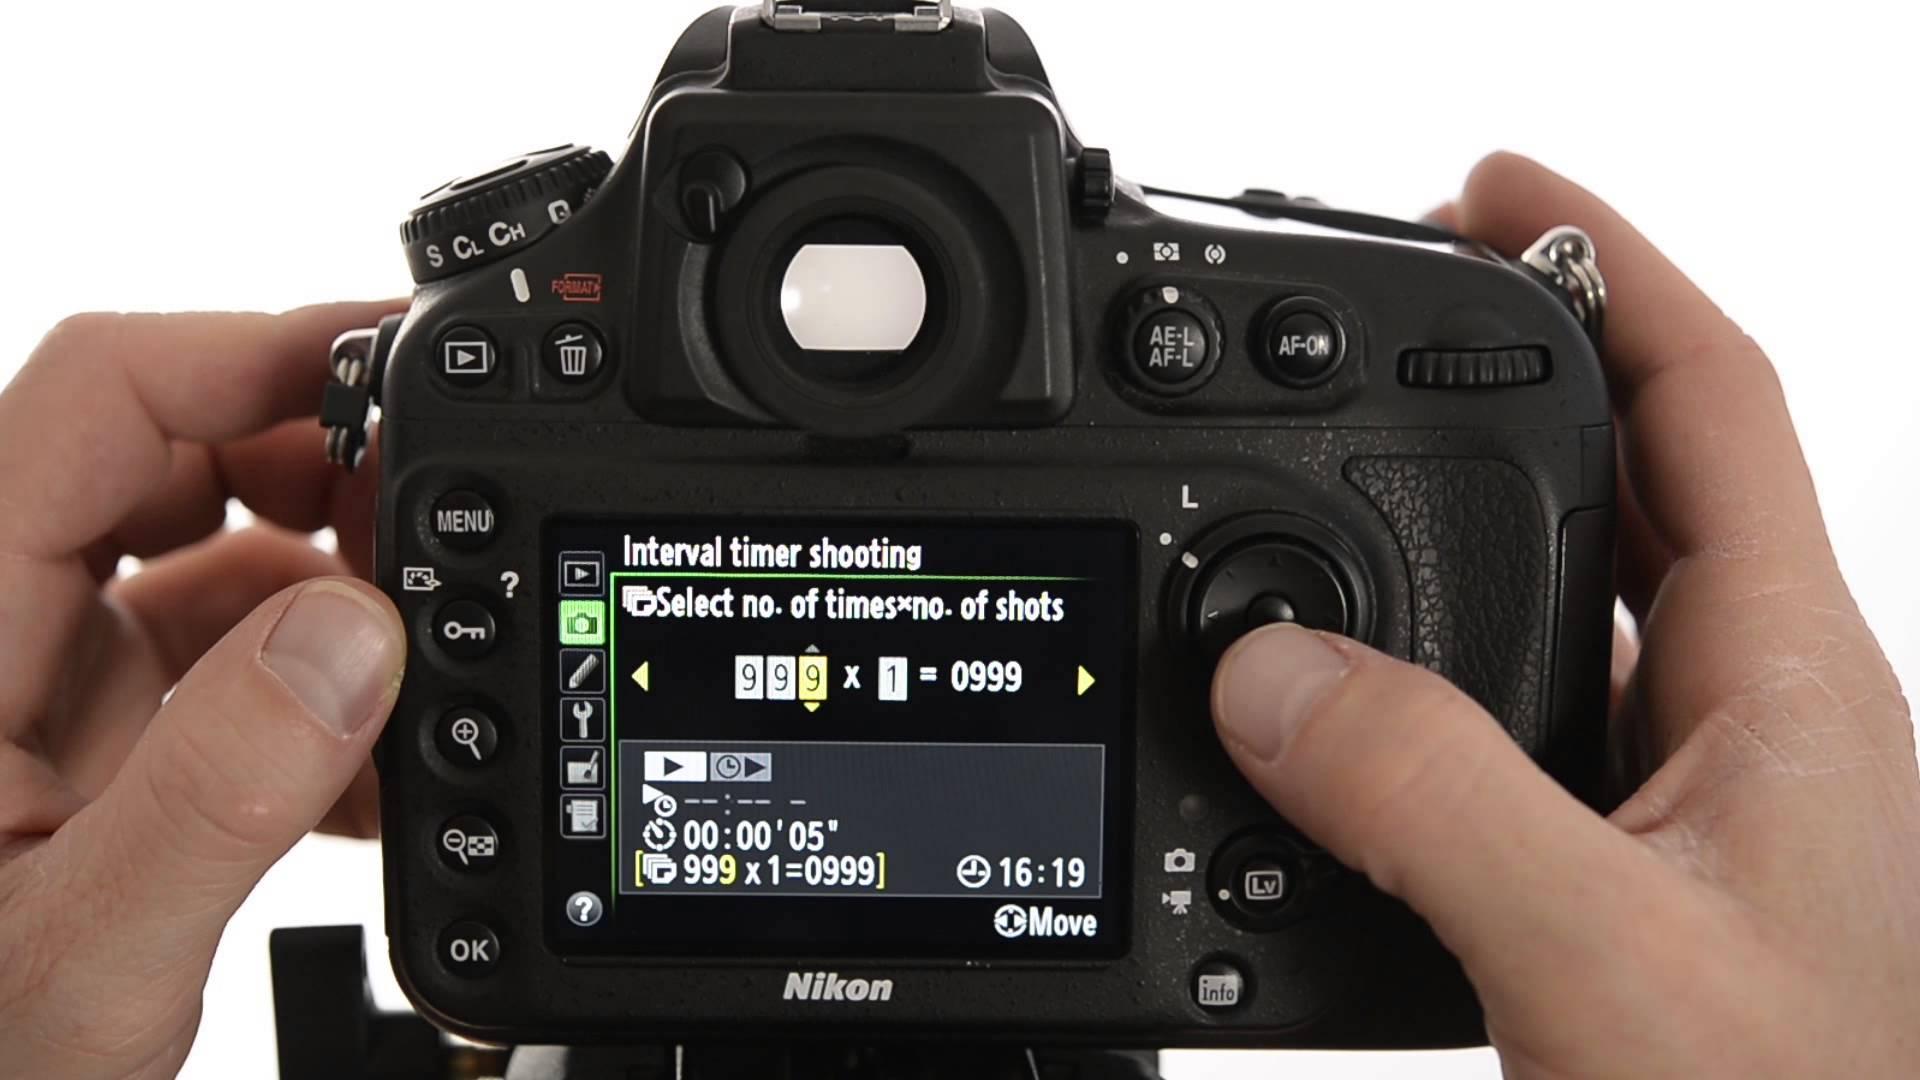 Taking a digital photograph